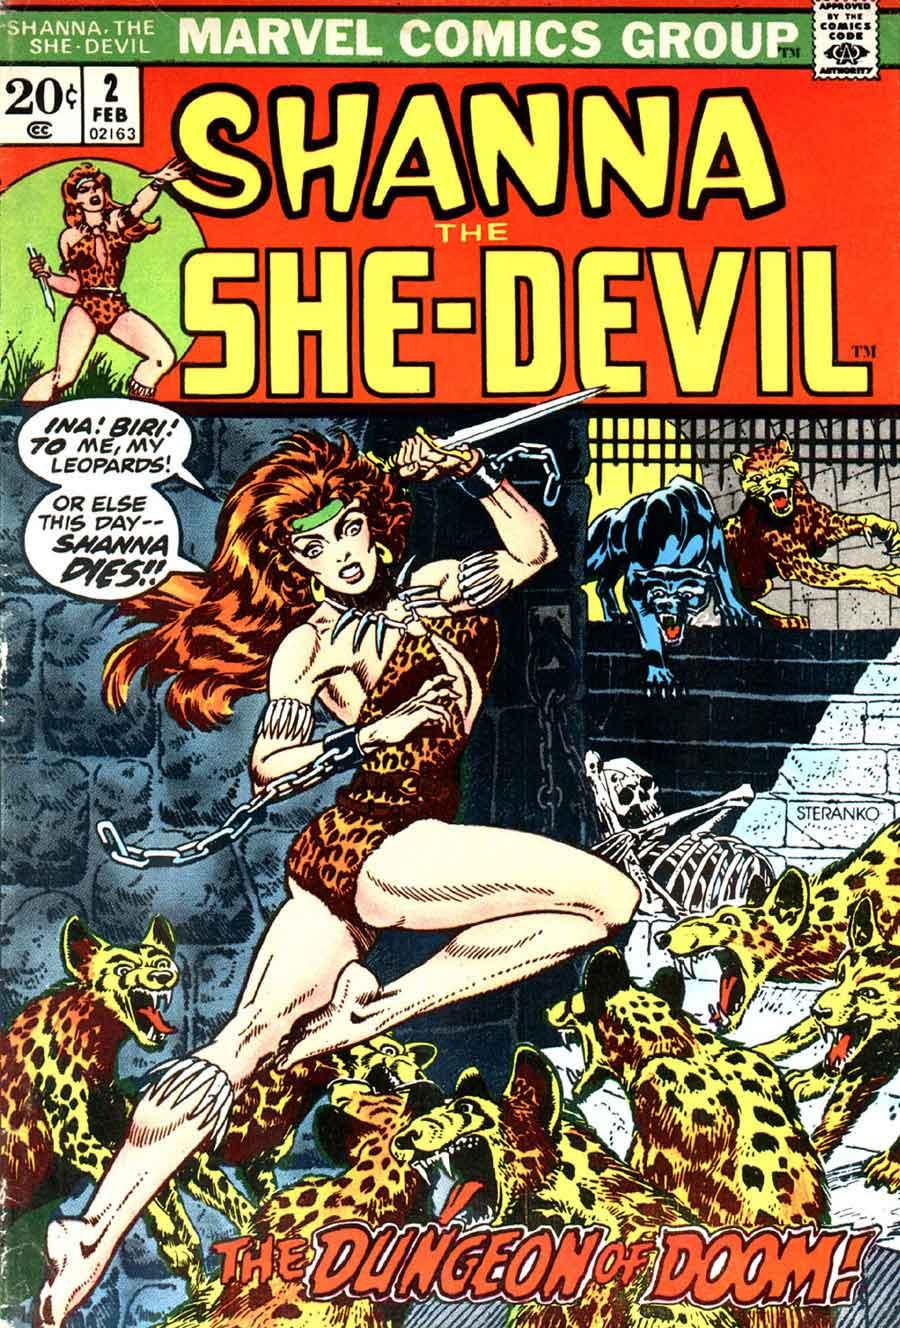 Shanna the She-Devil v1 #2 marvel 1970s bronze age comic book cover art by Jim Steranko